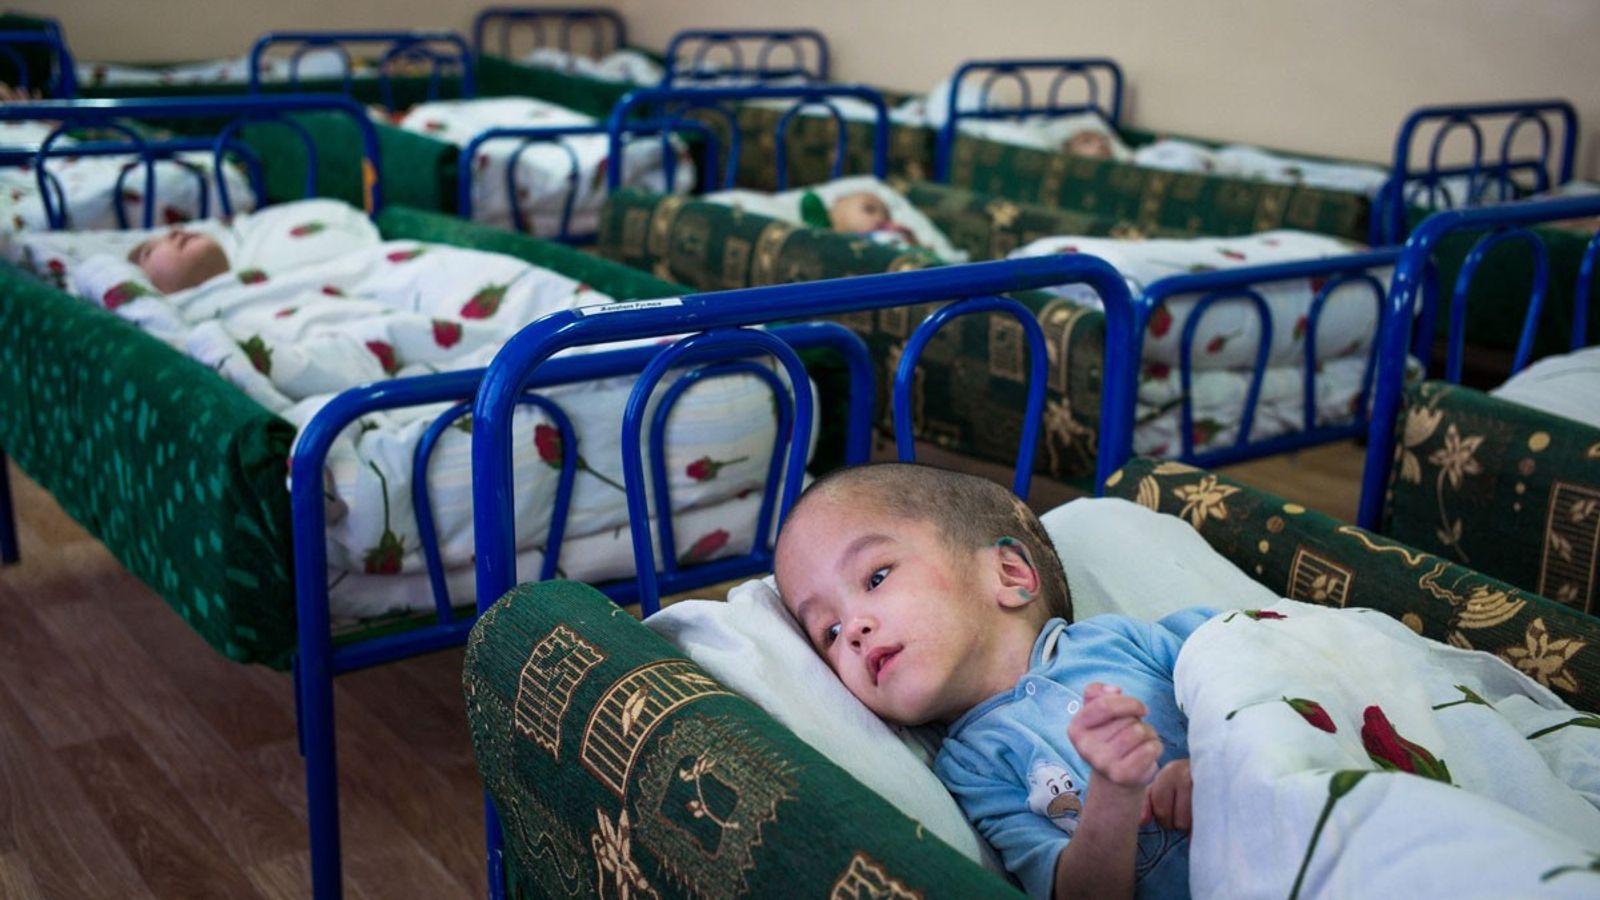 Junge in Bett